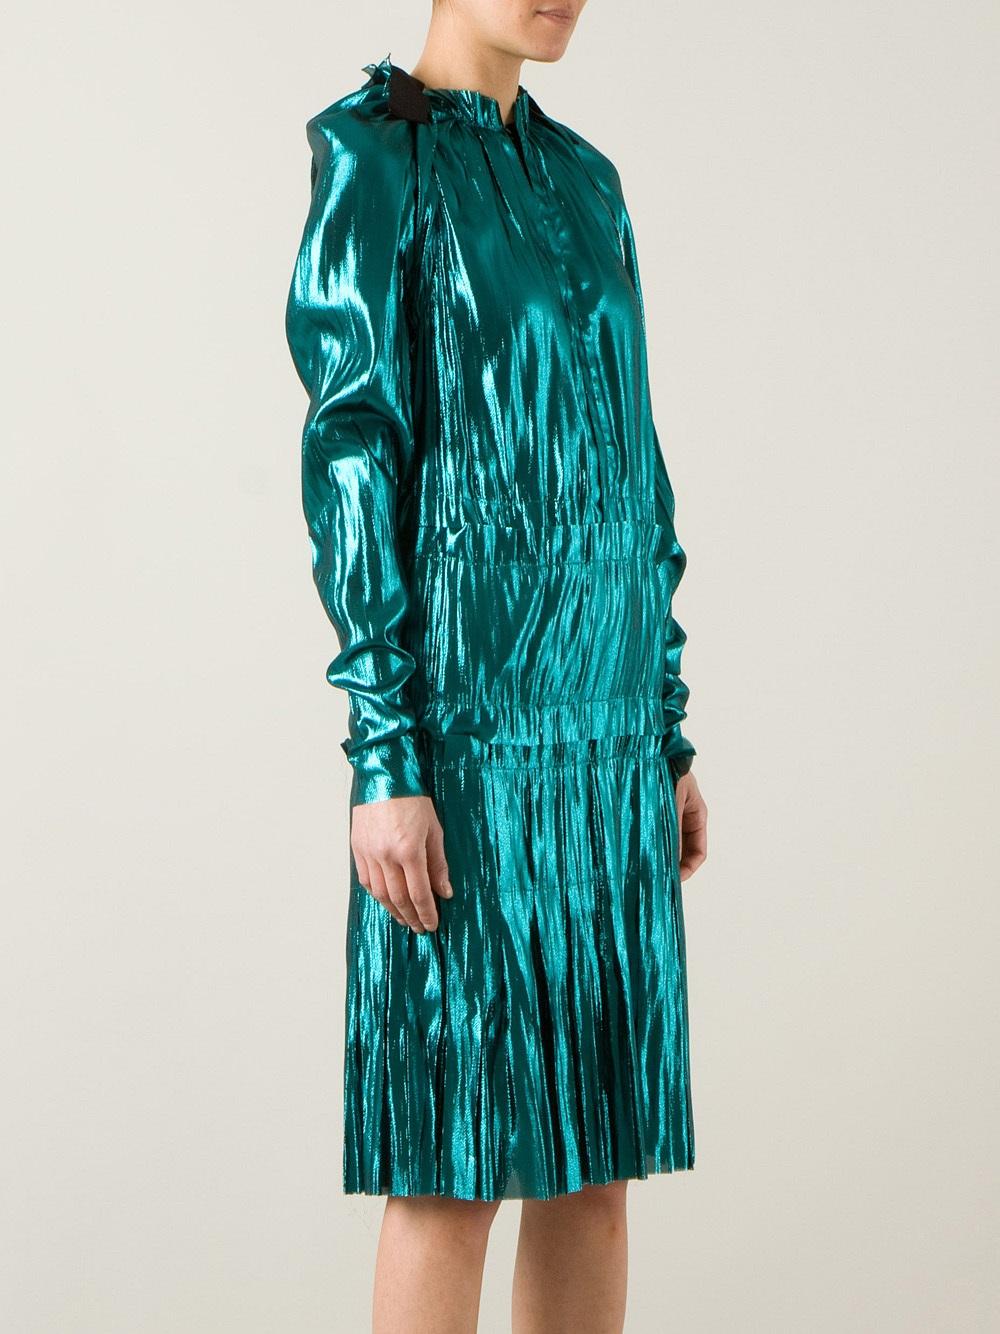 Lanvin Woman Ruffled Metallic Printed Velvet Dress Petrol Size 40 Lanvin Get To Buy Sale Online Factory Outlet Sale Online WcMB0k